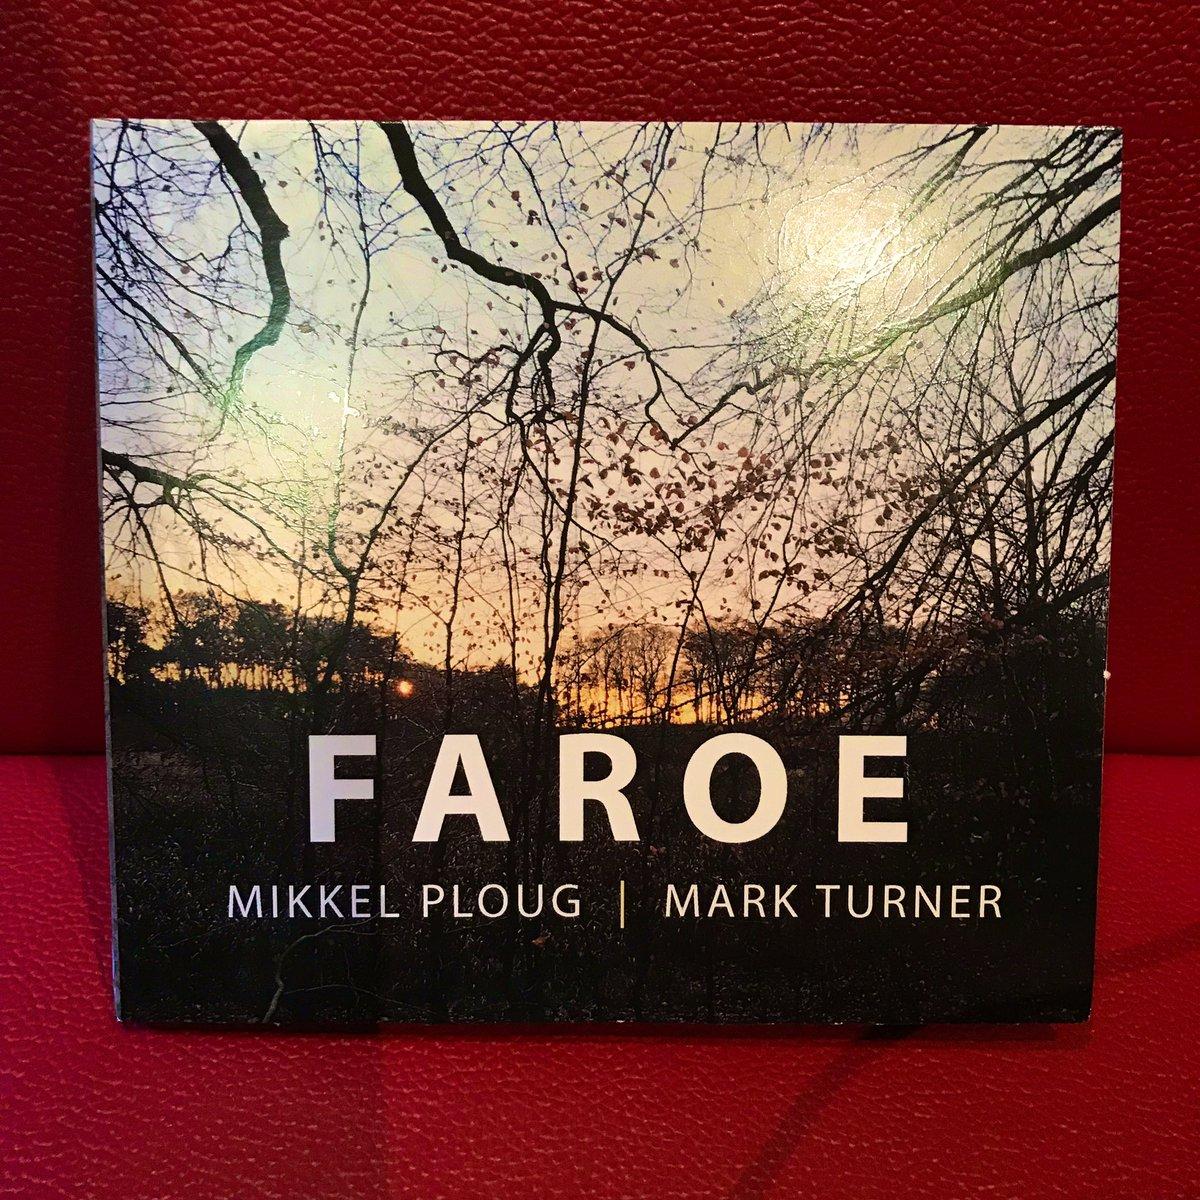 FAROE Mikkel Ploug & Mark Turner  デンマーク出身のギタリスト、ミケル・プラウグと、テナー・サックス奏者、マーク・ターナーのデュオ作。  アコースティックとエレキ比率は半々くらい。 凝ったコード、シンプルなメロディのコンテンポラリーデュオ。  #ジャズ喫茶 #喫茶店 #ジャズ #喫煙可 #WiFi